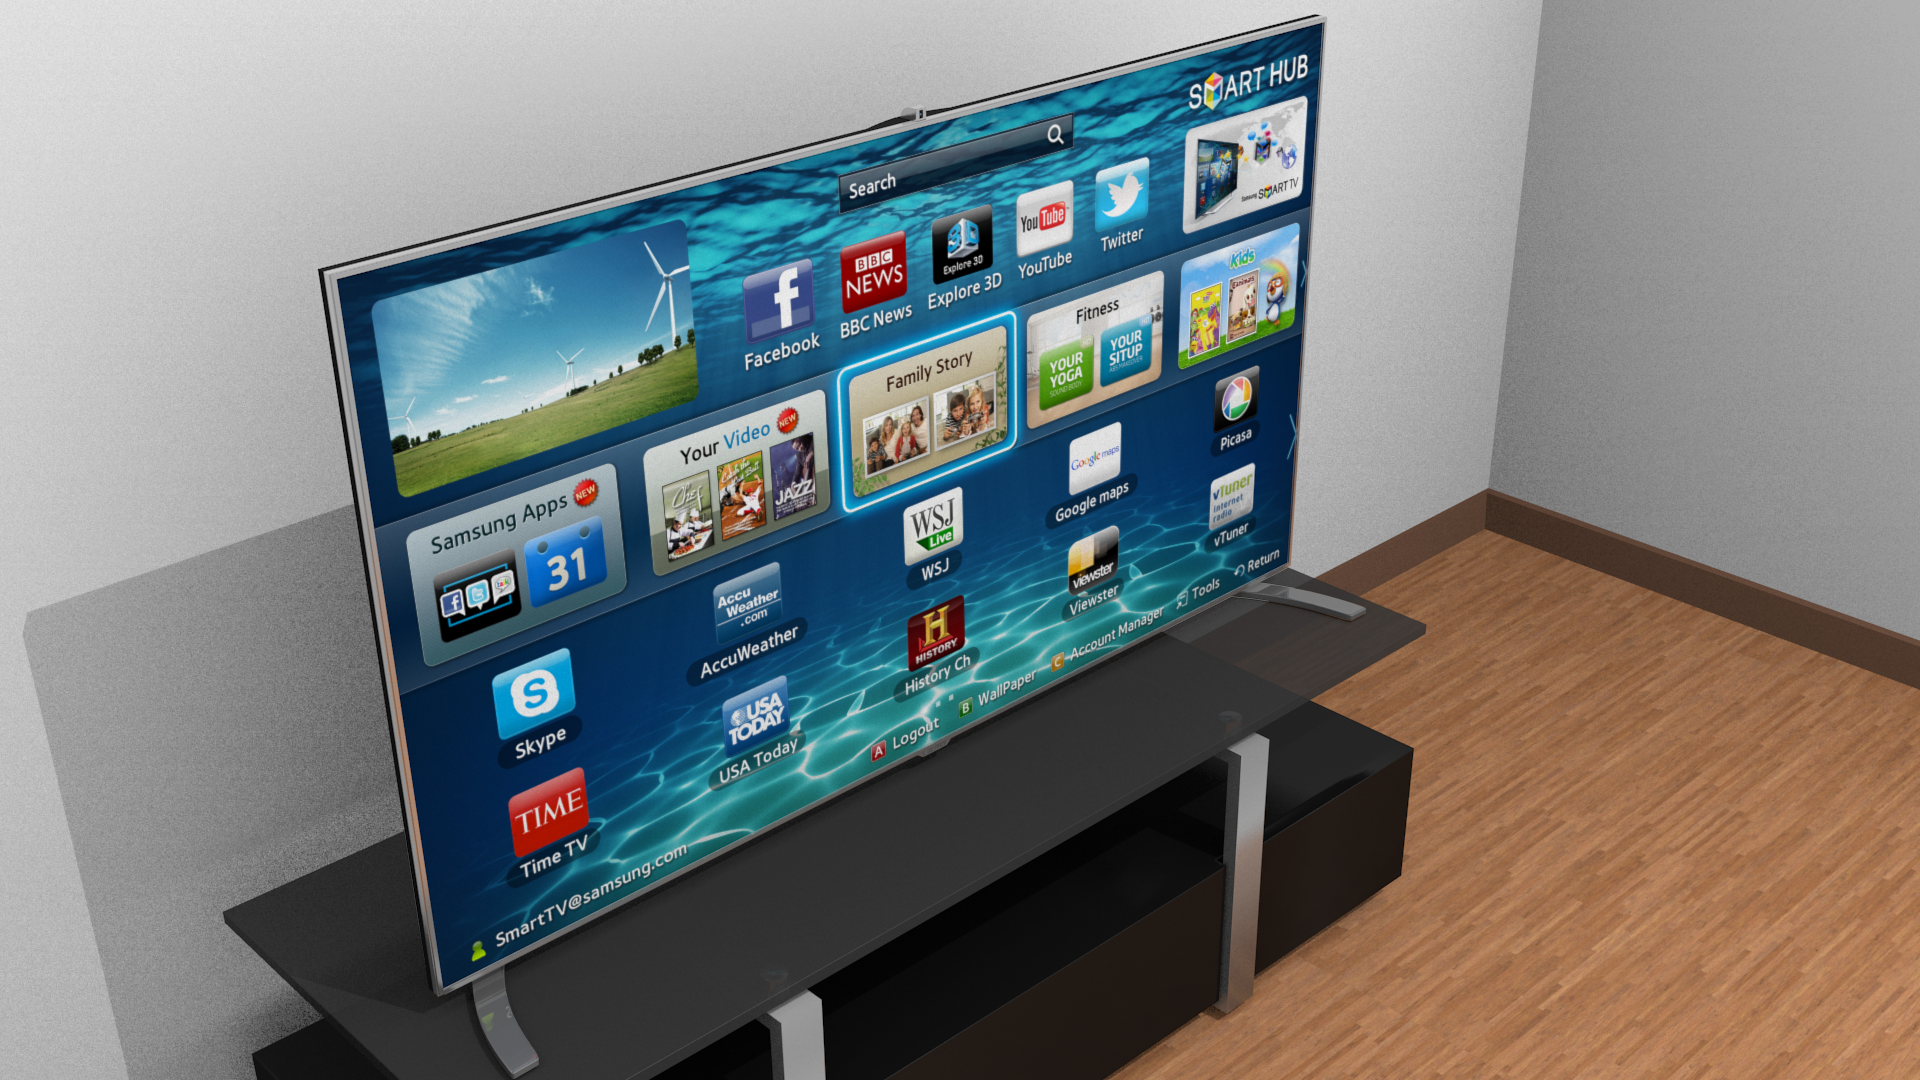 Samsung Smart Tv 39876 3d Model Cgtrader # Modele Table Tv